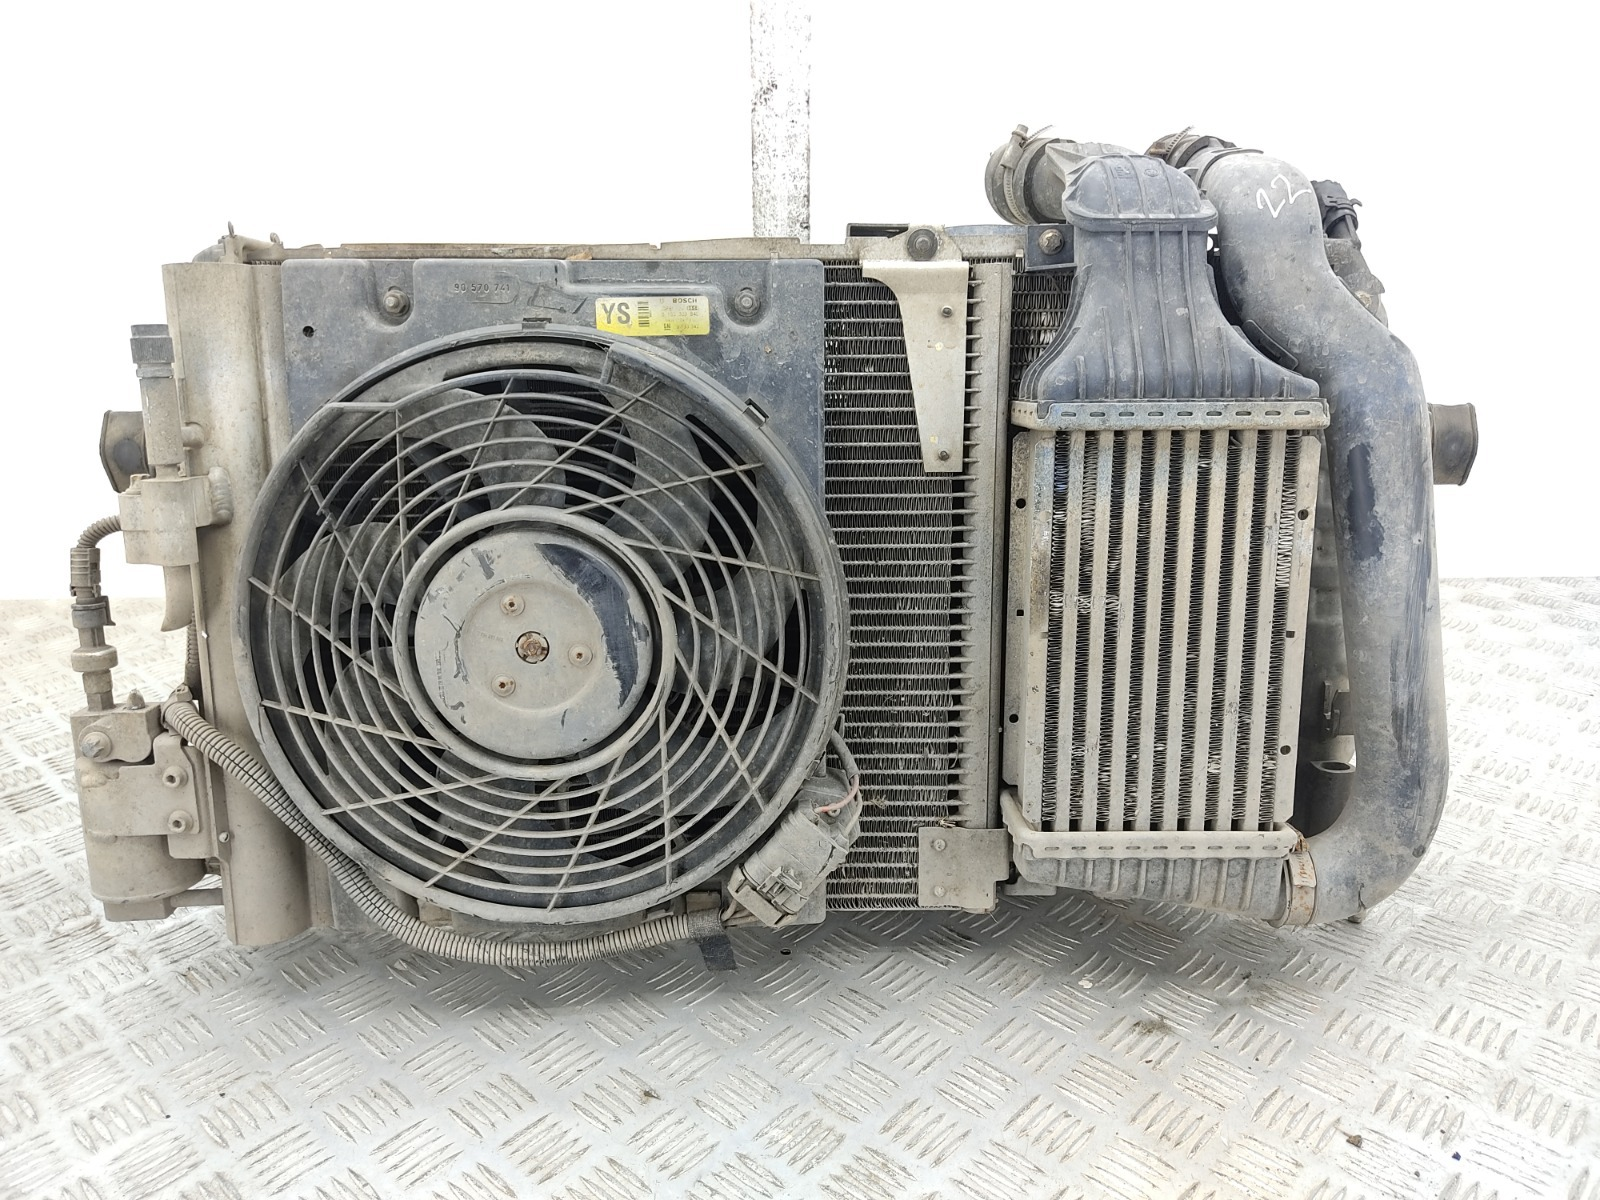 Кассета радиаторов Opel Zafira A 2.0 DTI 2004 (б/у)